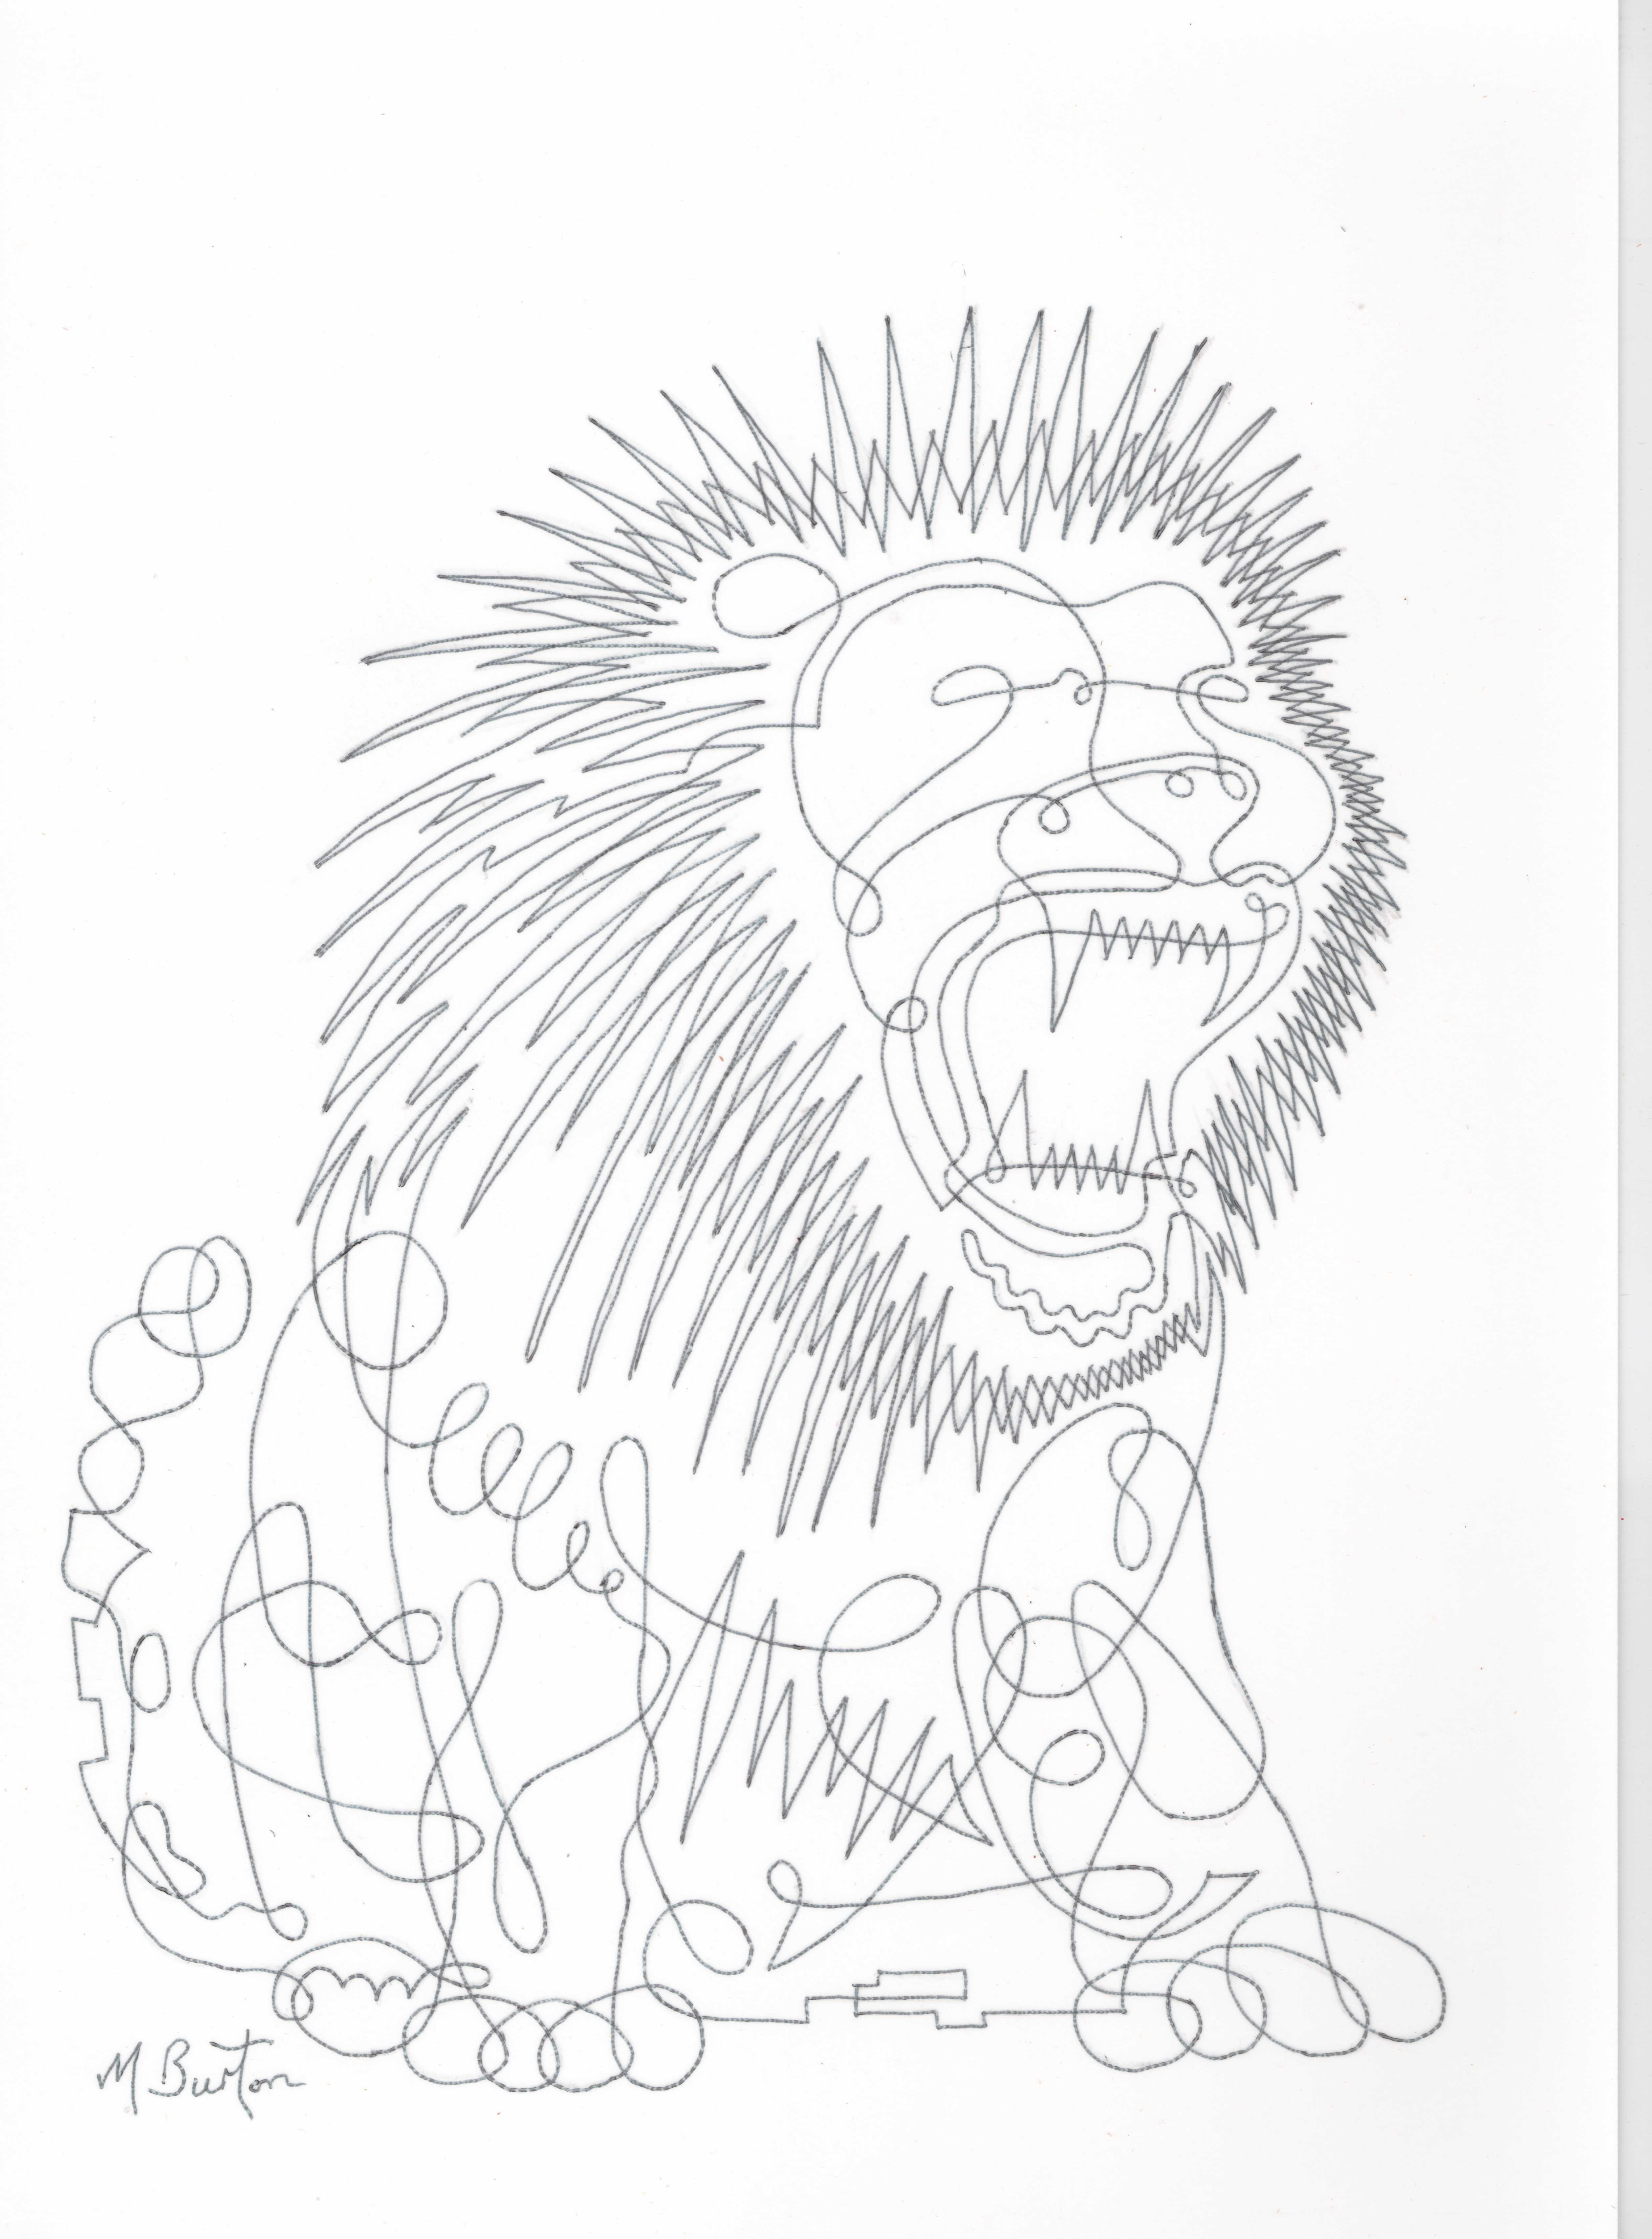 5032x6818 Animals In My Art How I Started. Mick Burton